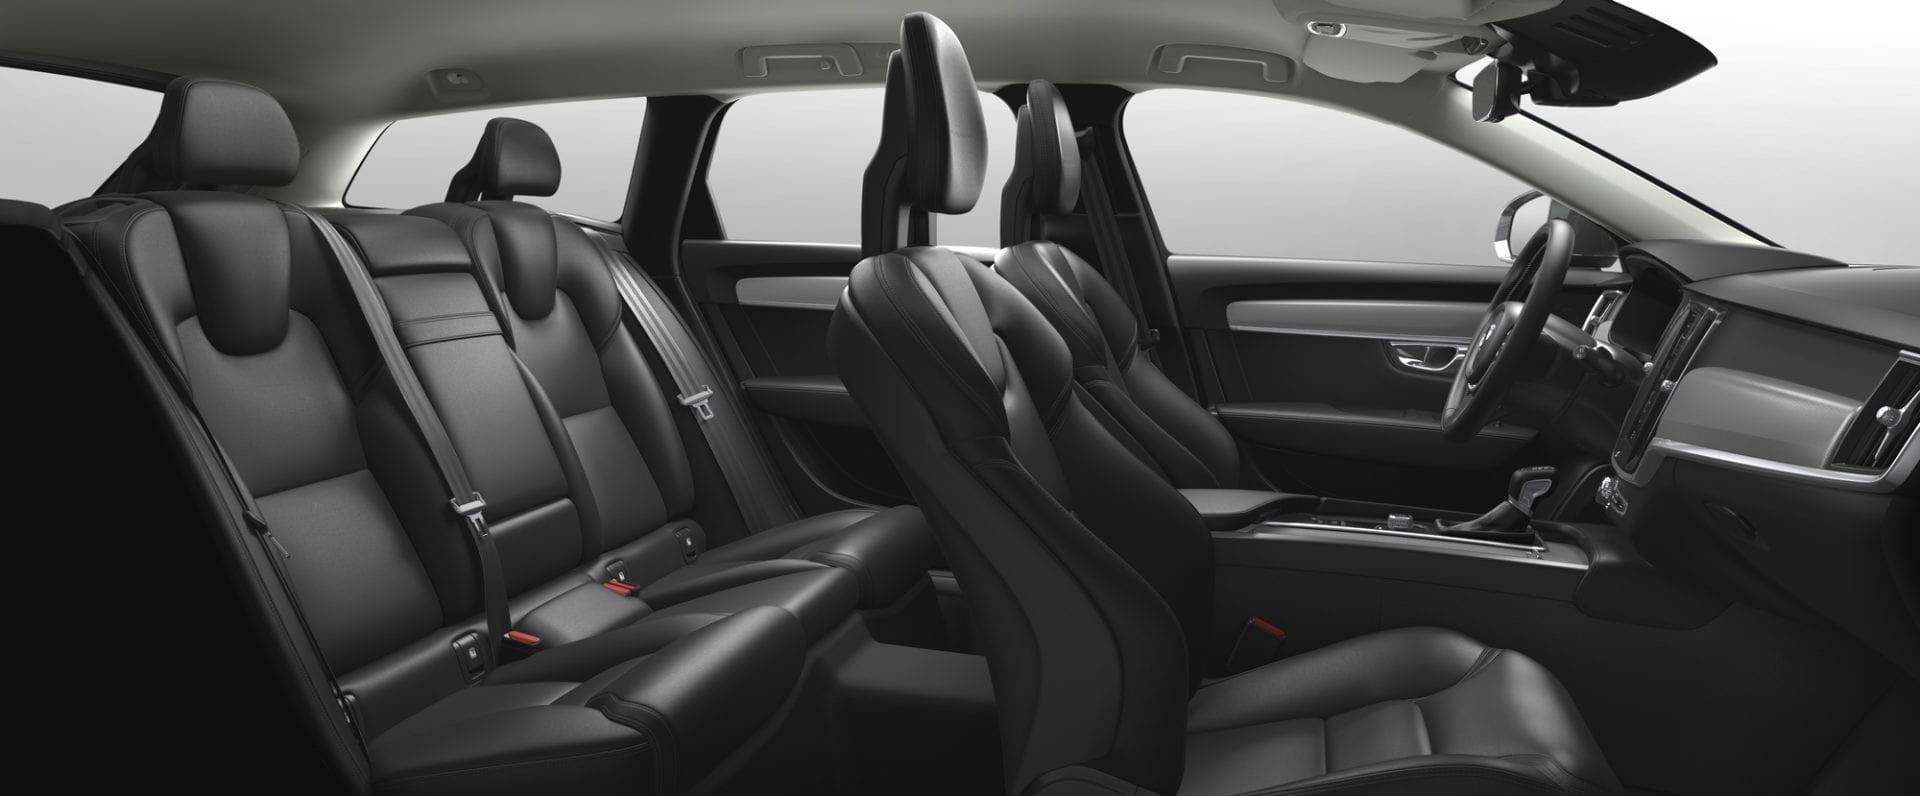 Volvo V90 Cross Country ua  фото интерьера 4